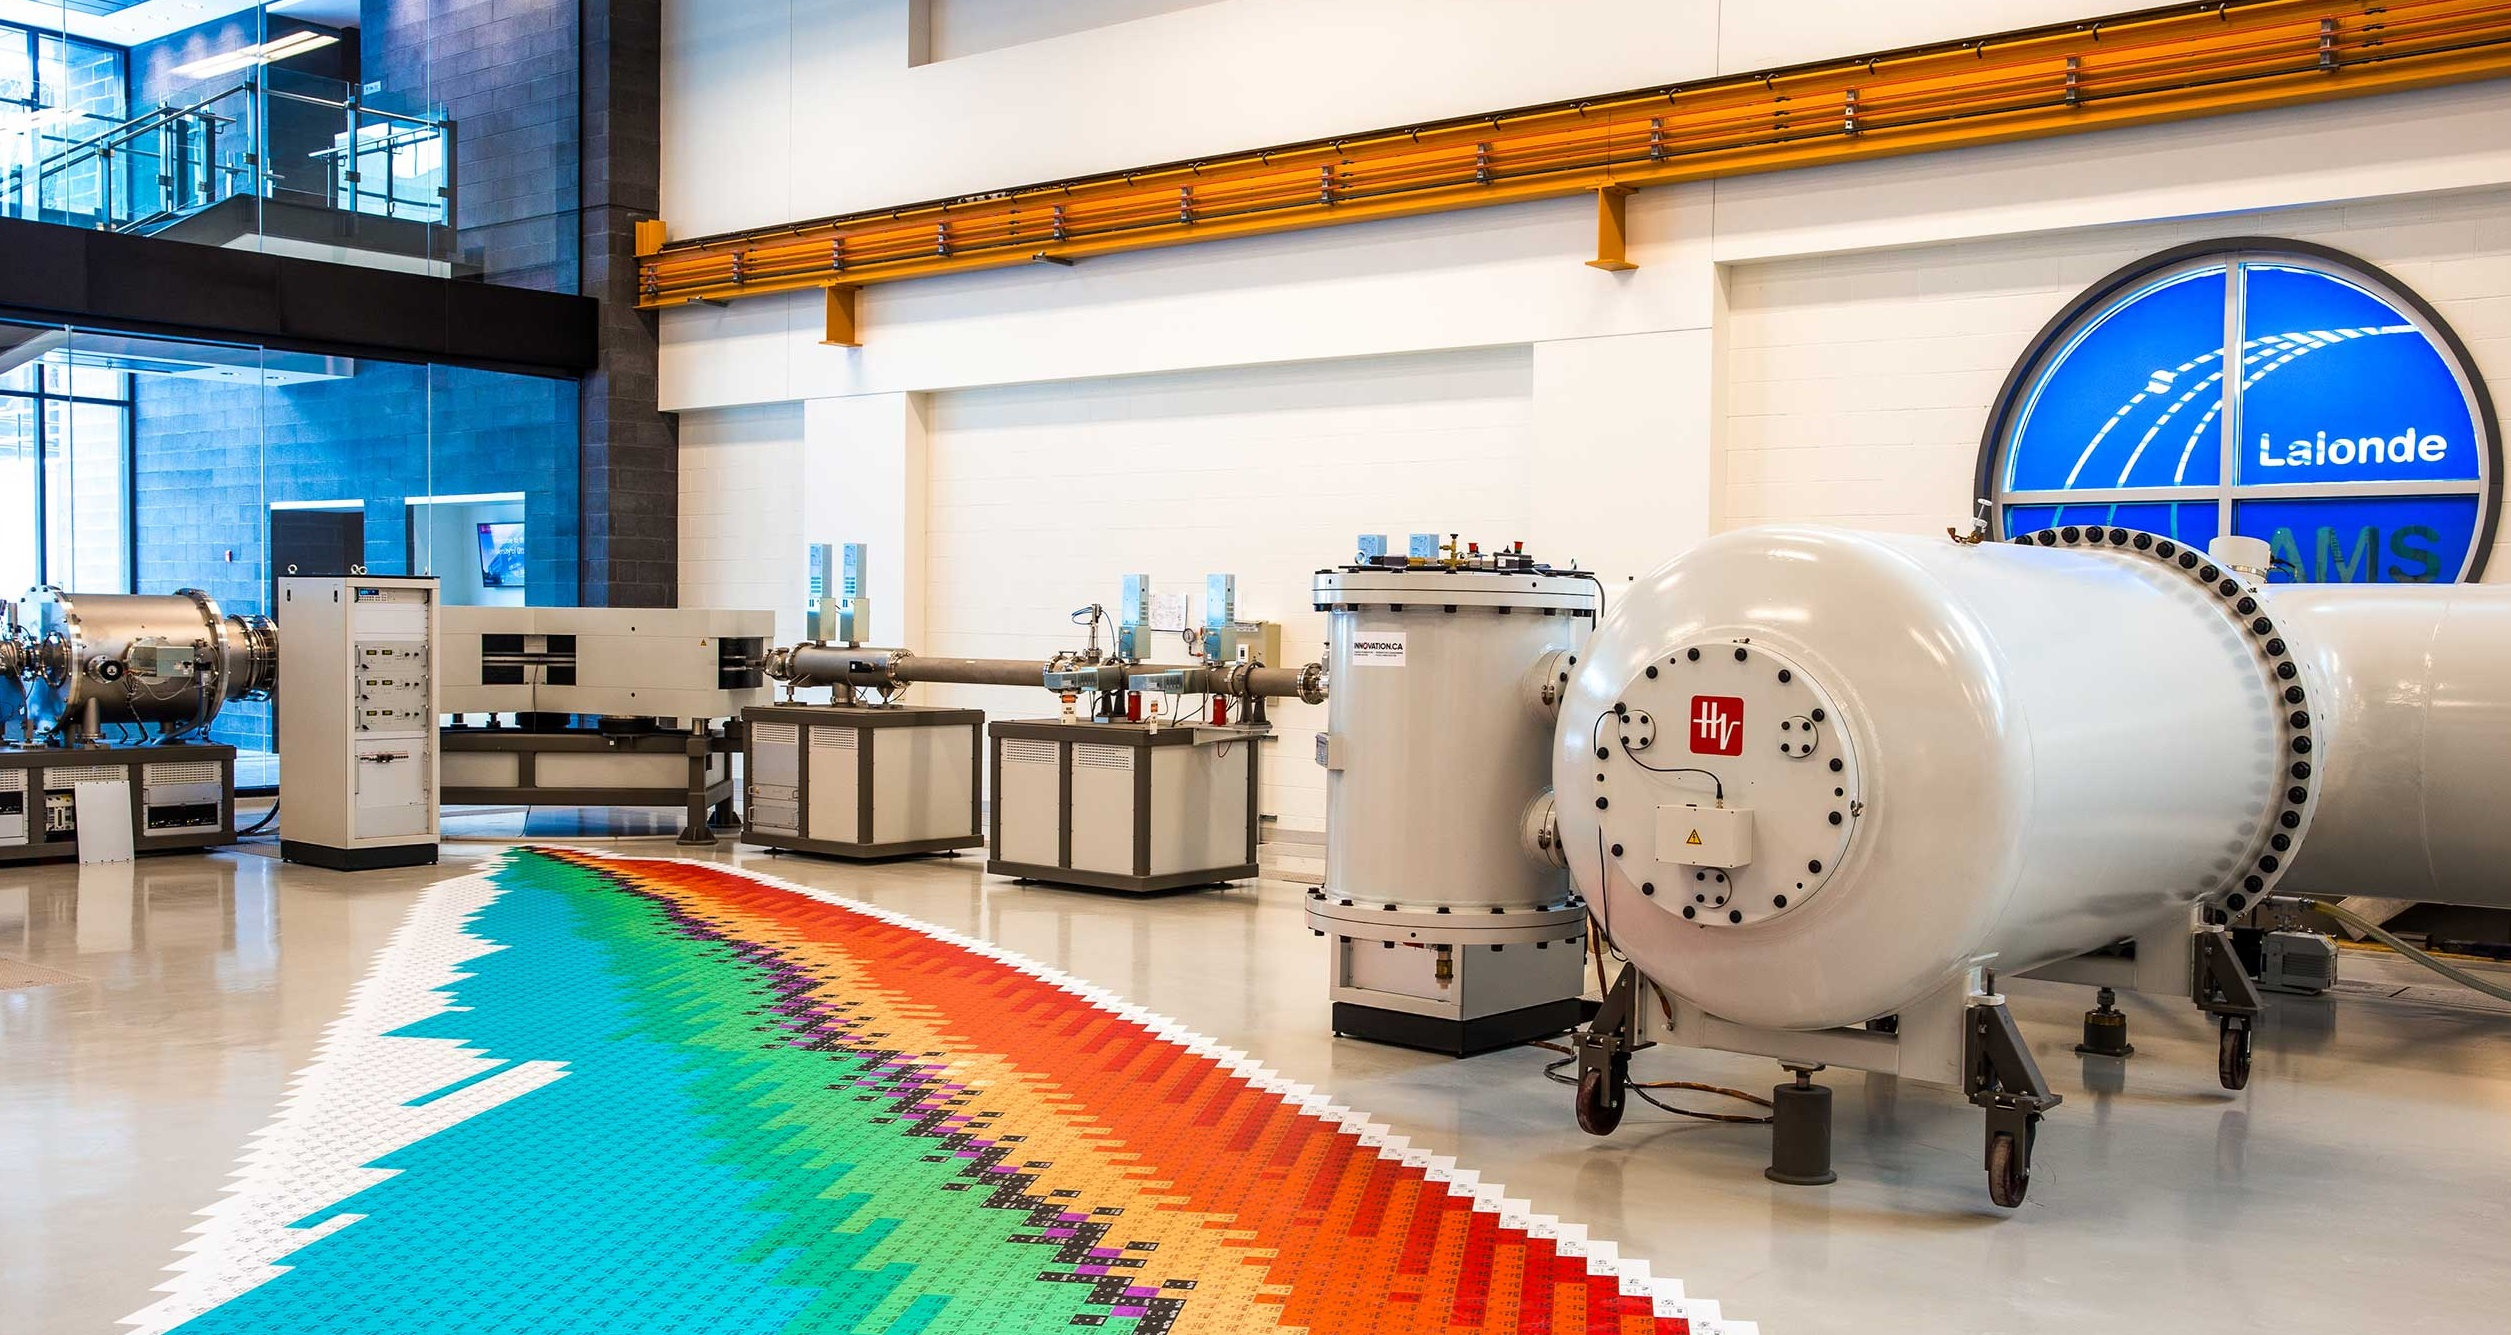 Photo of an accelerator mass spectrometer, a high tech piece of scientific equipment